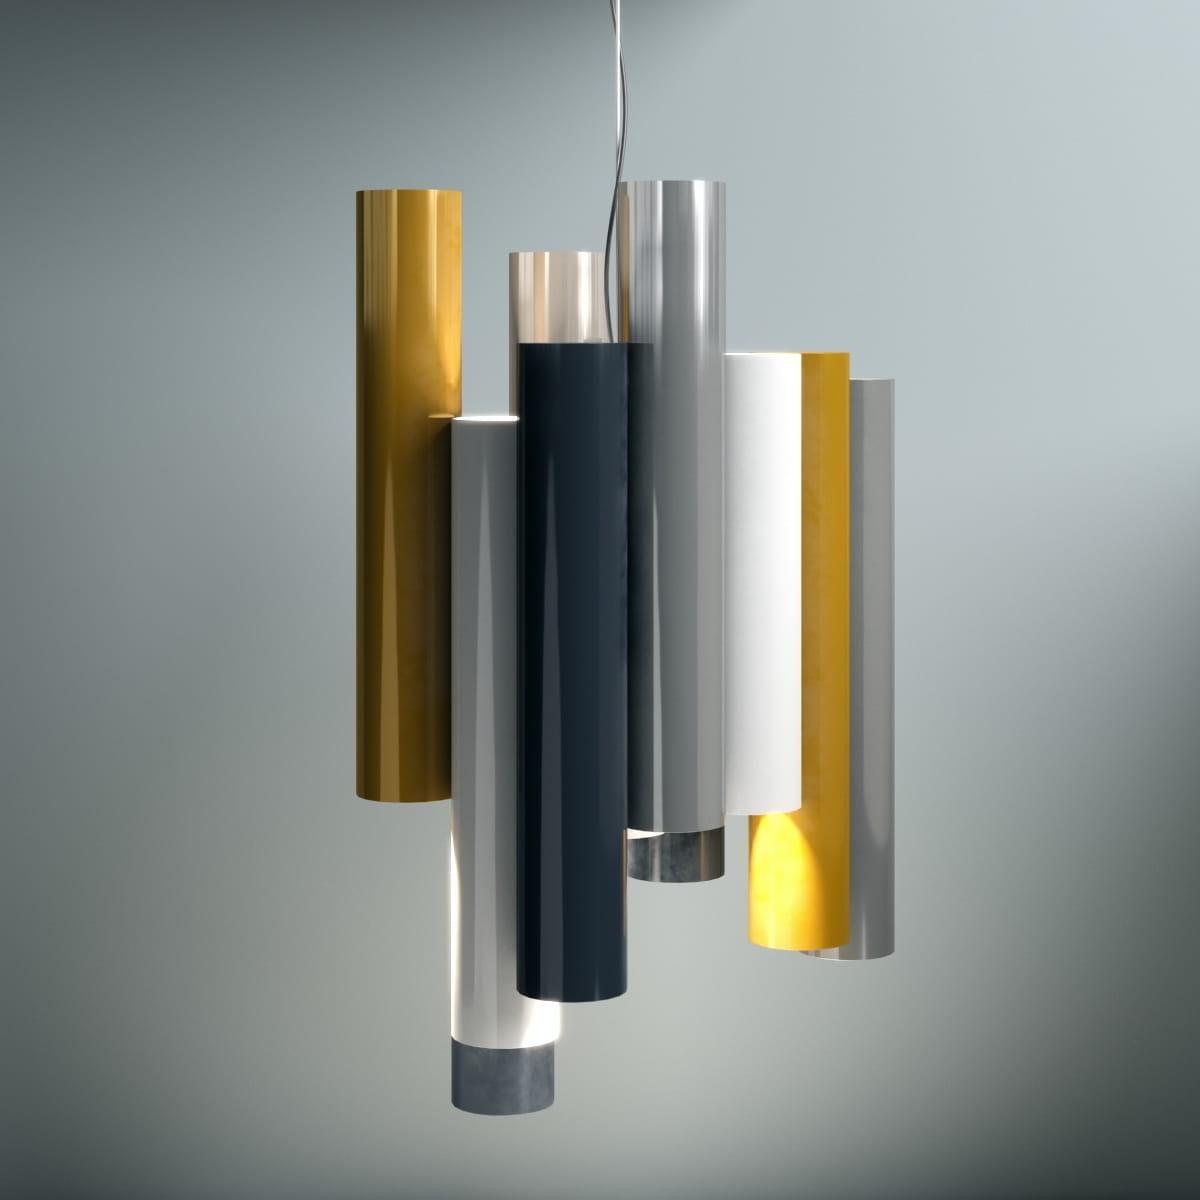 lamp 40 AM247